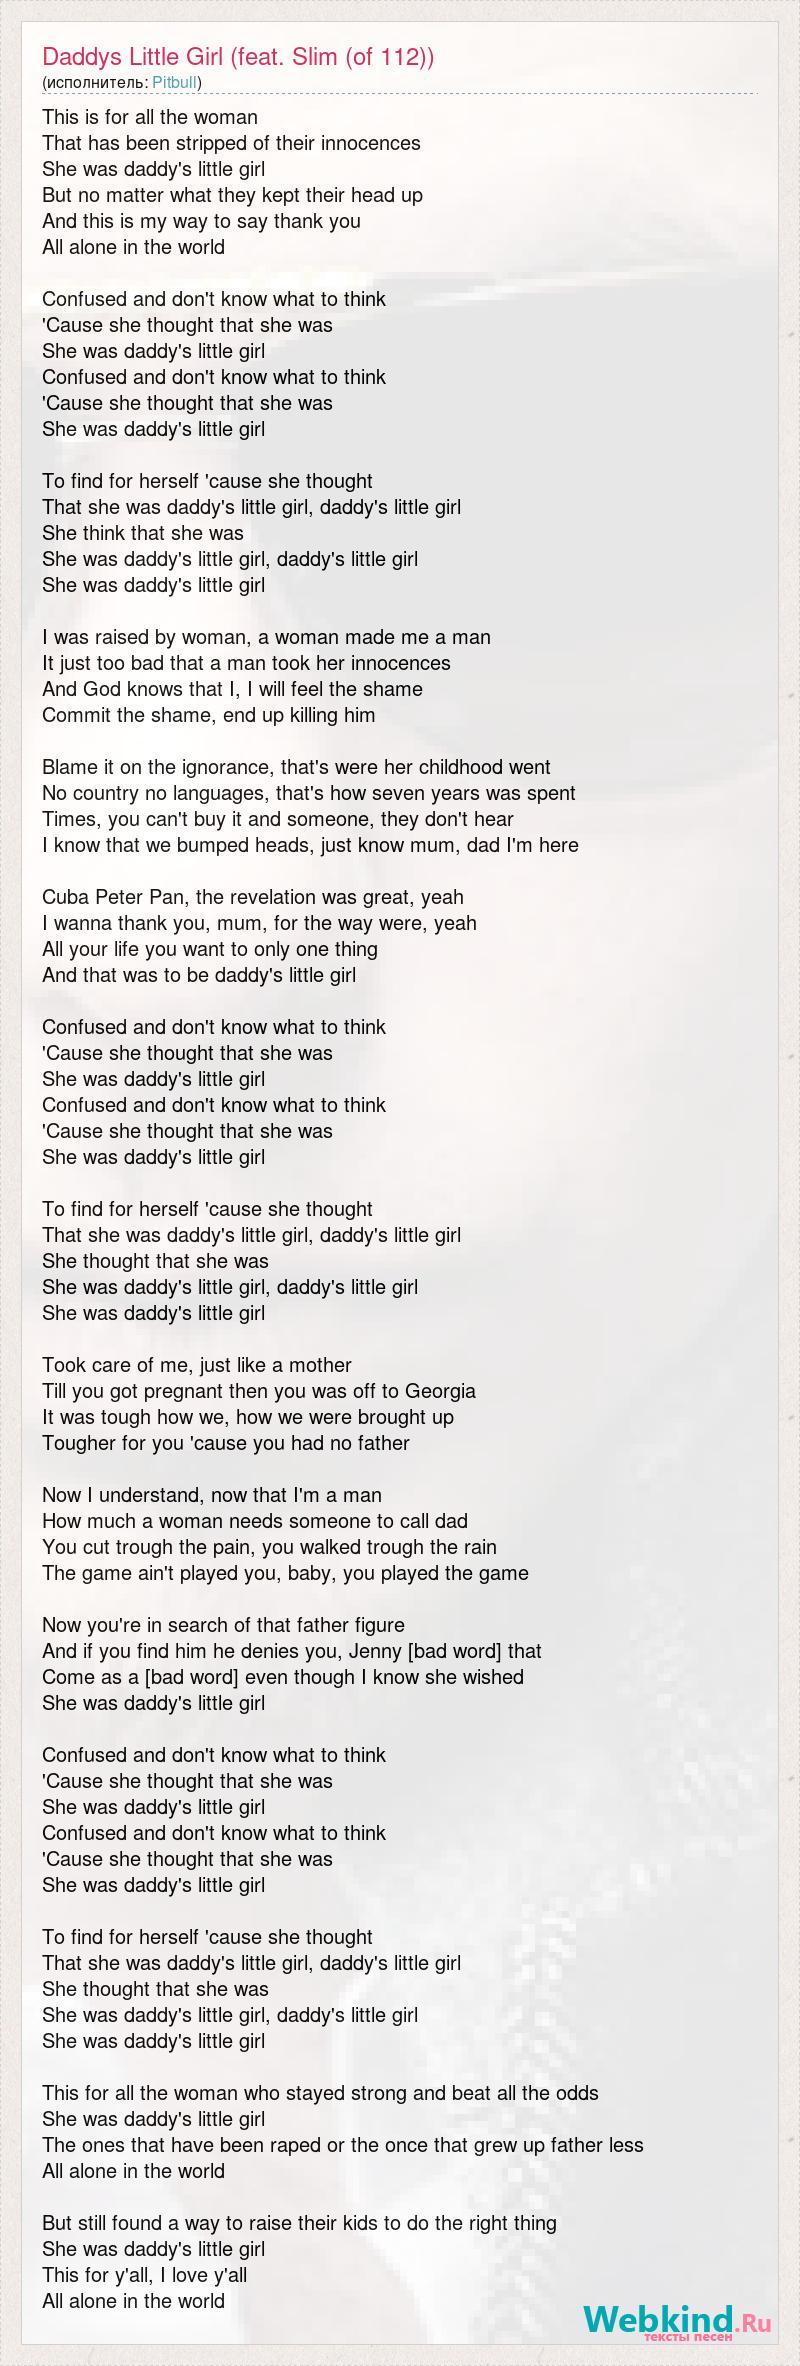 Pitbull: Daddys Little Girl (feat  Slim (of 112)) слова песни